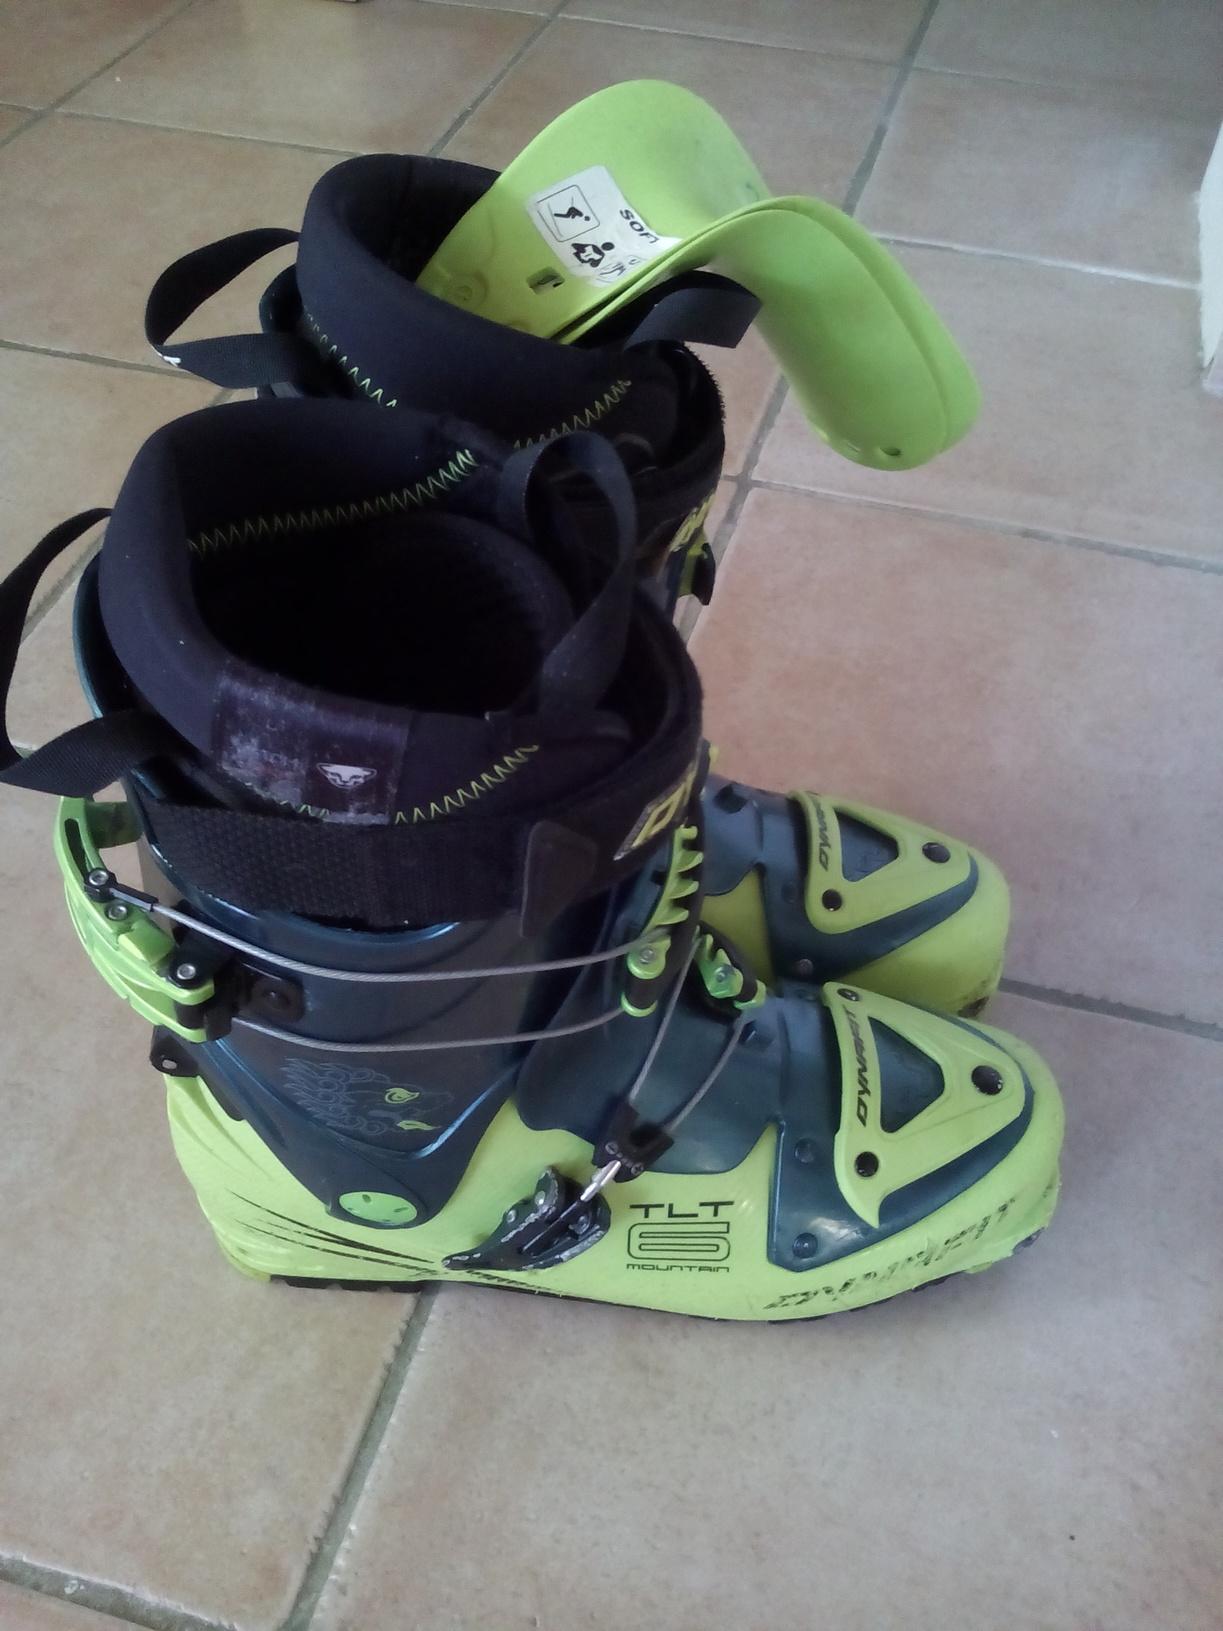 chaussures ski rando dynafit tlt 6 montain cl 44 28 5. Black Bedroom Furniture Sets. Home Design Ideas